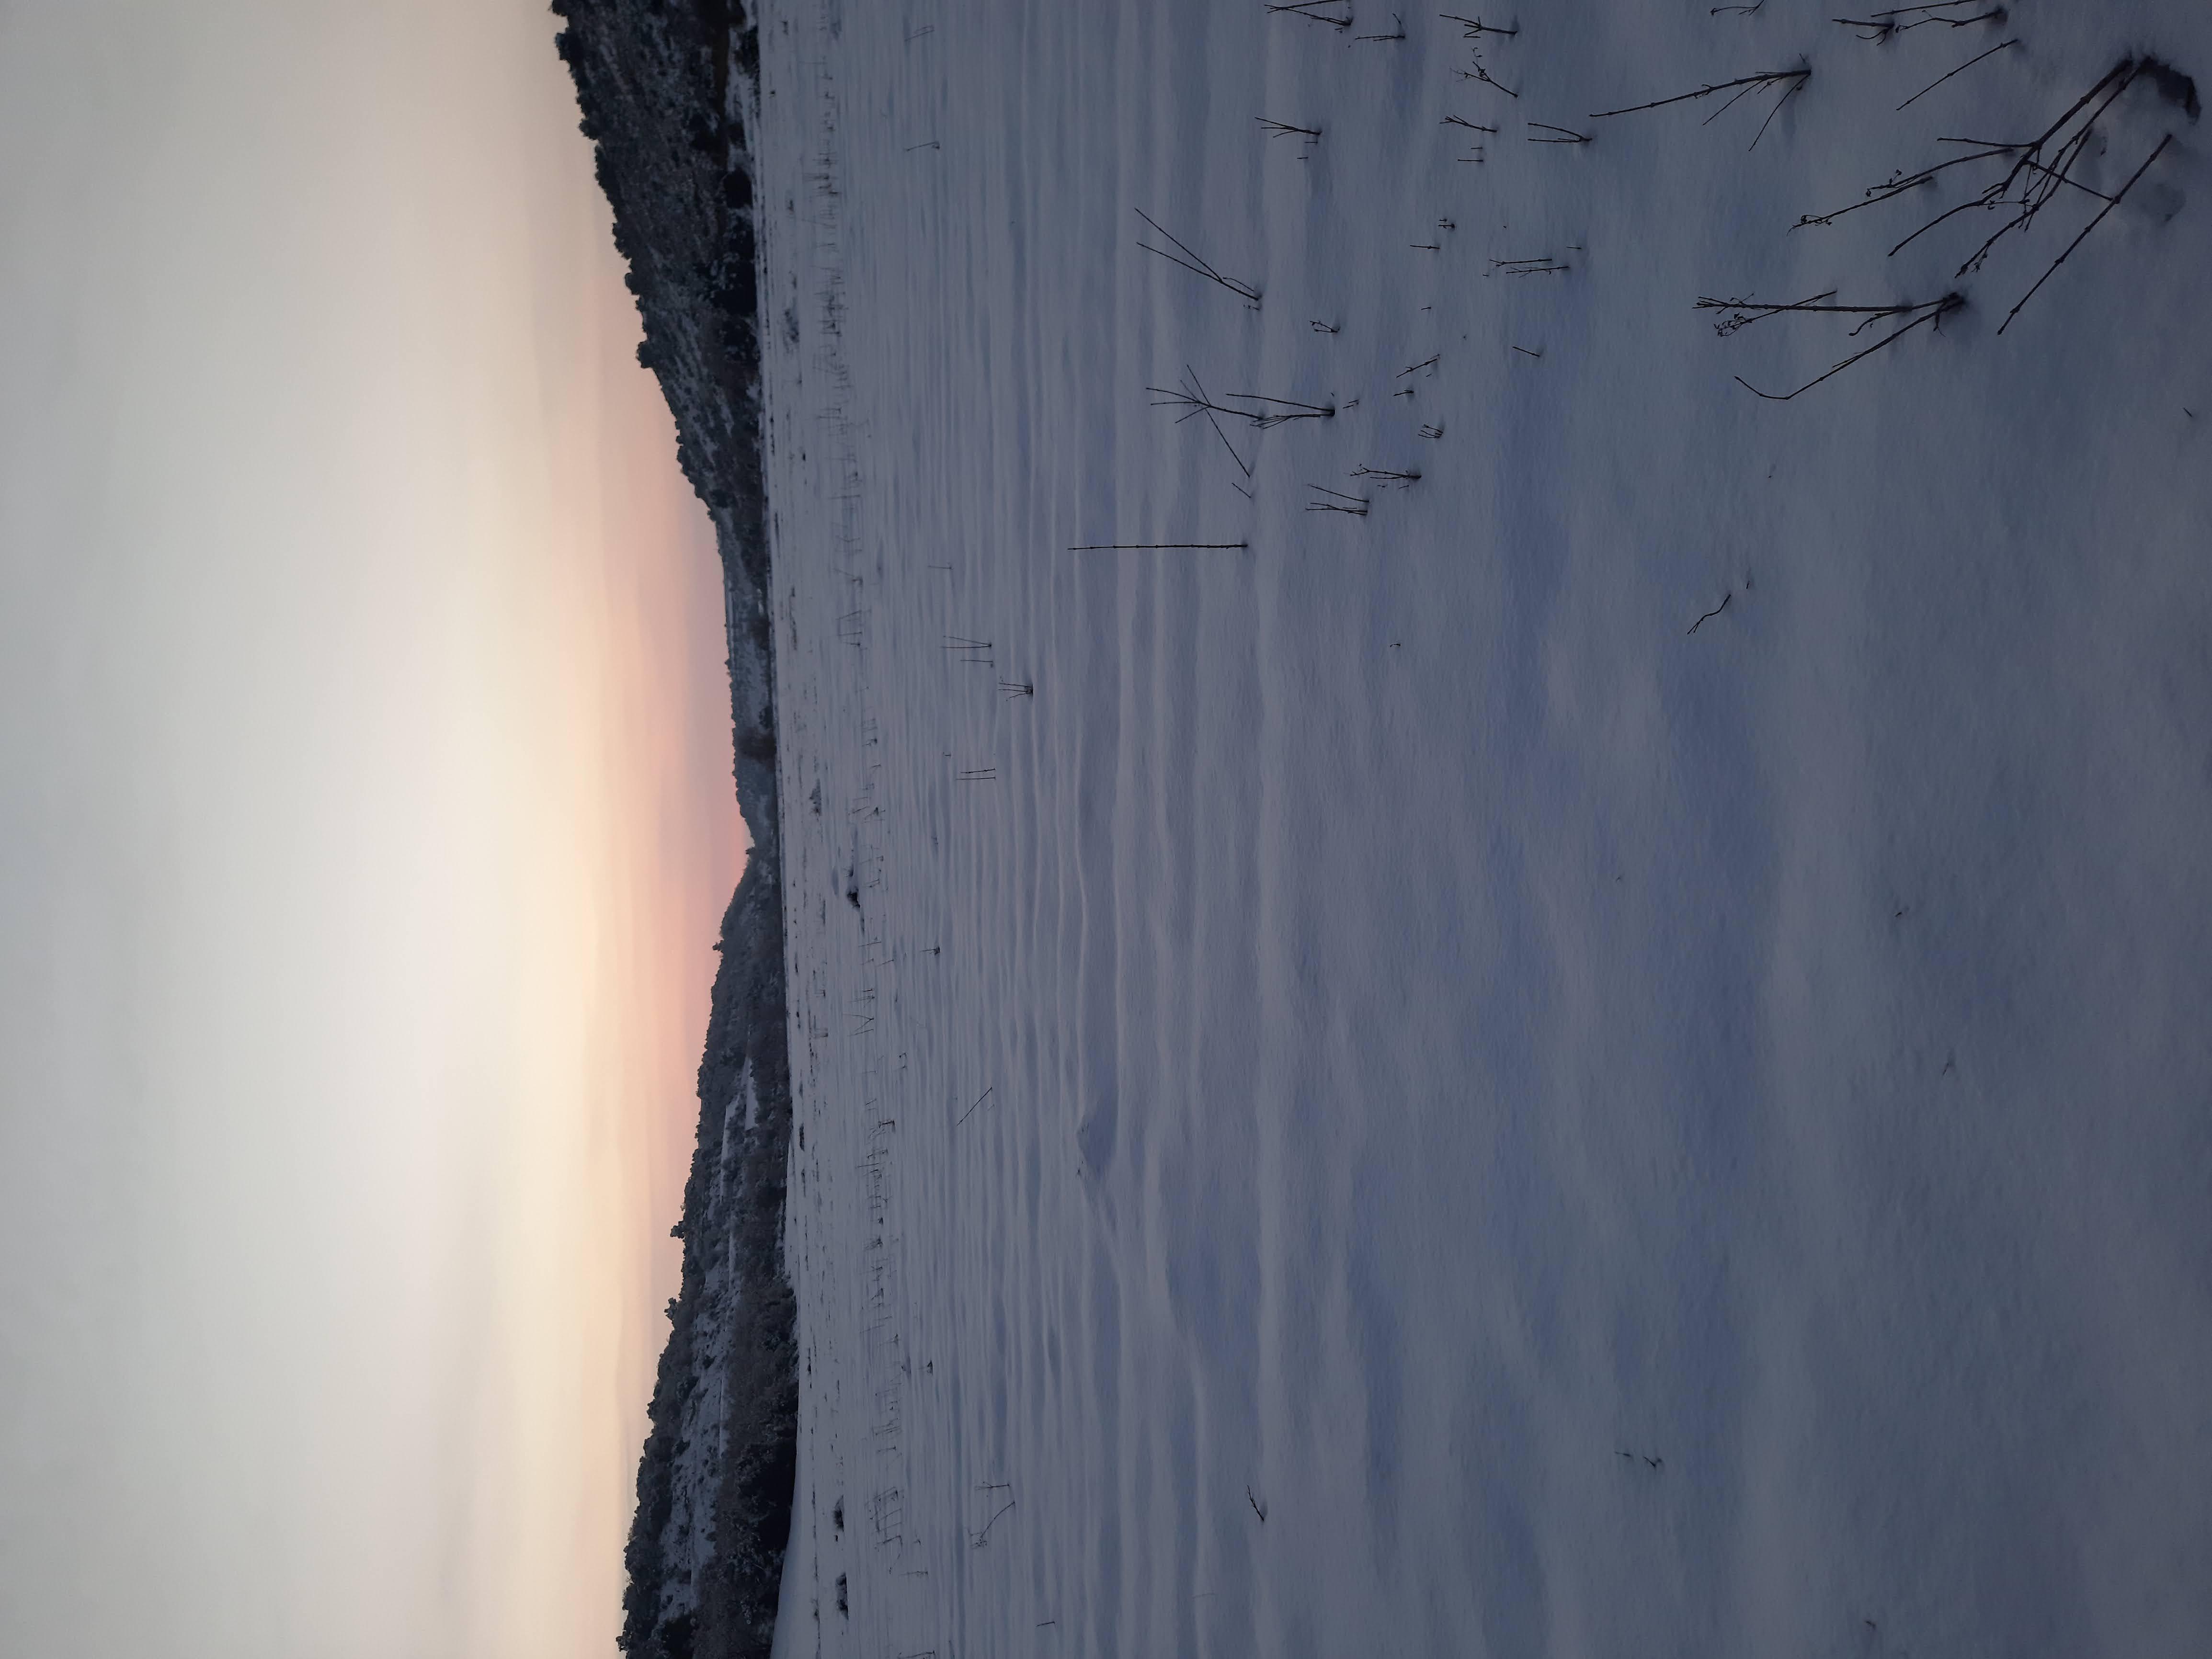 Fotos nevada gener 2021